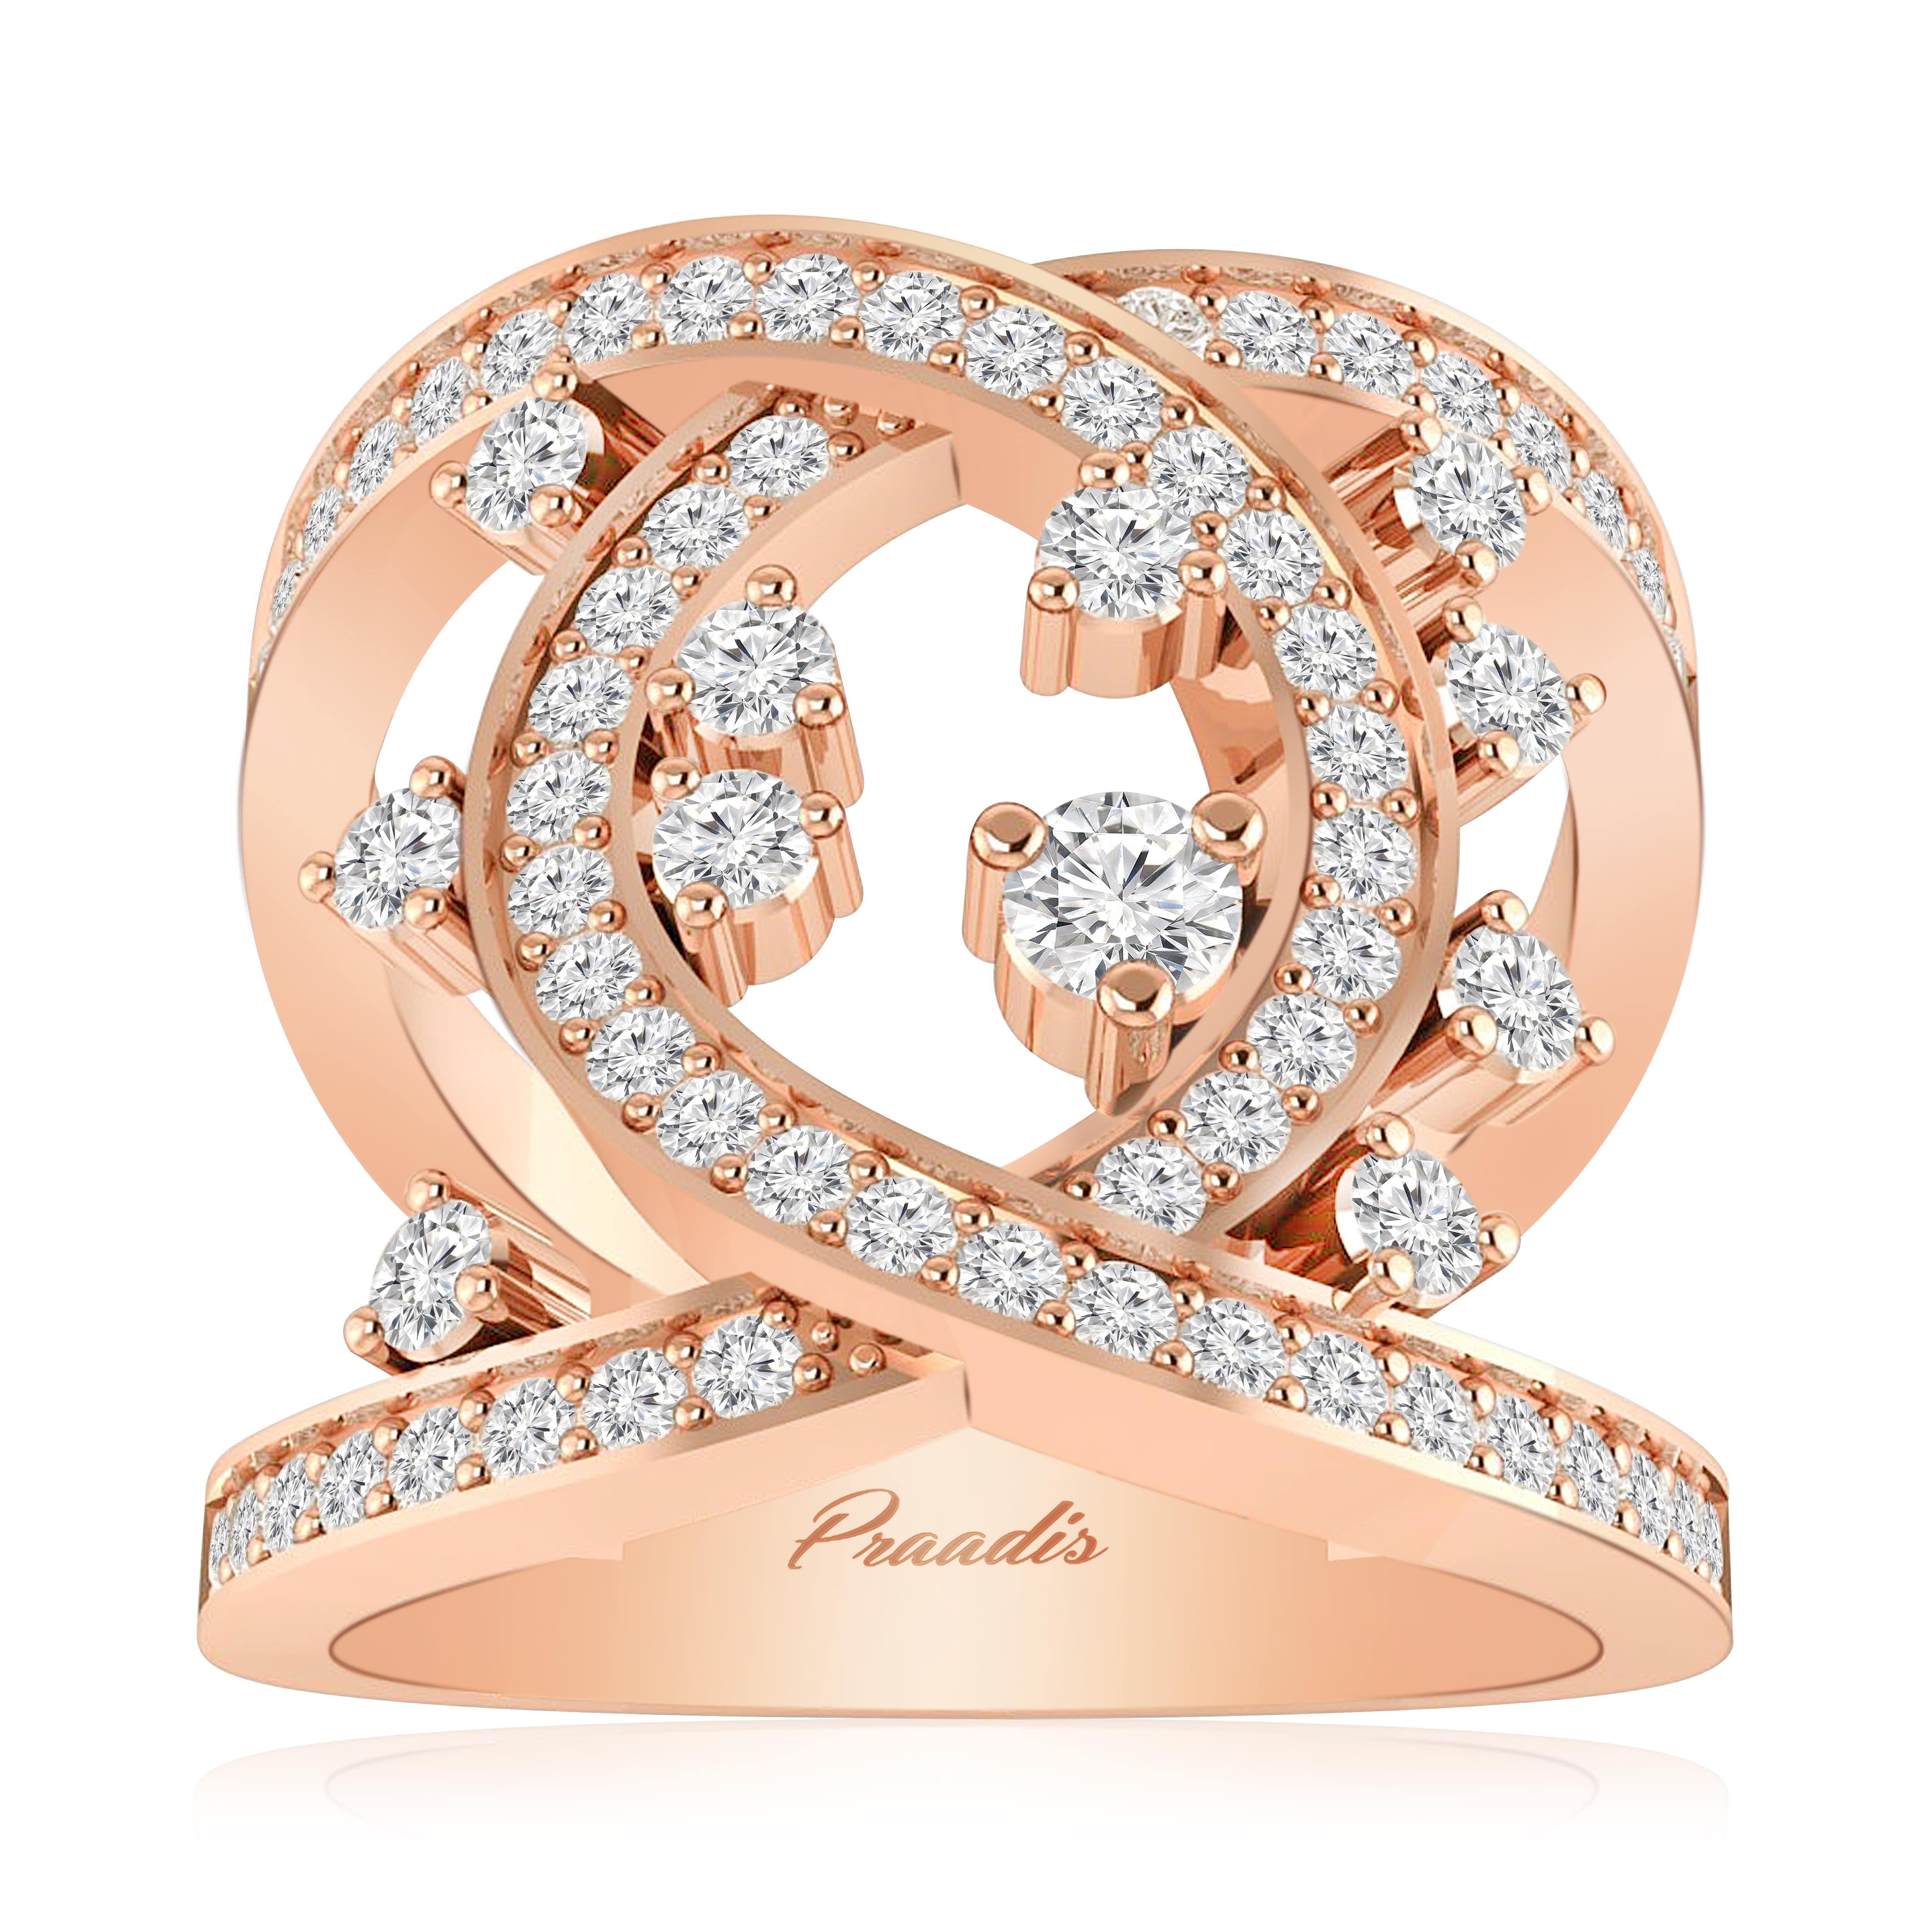 Fantastic Supreme Cocktail Ring | White Diamond | 14Kt Rose Gold NI32